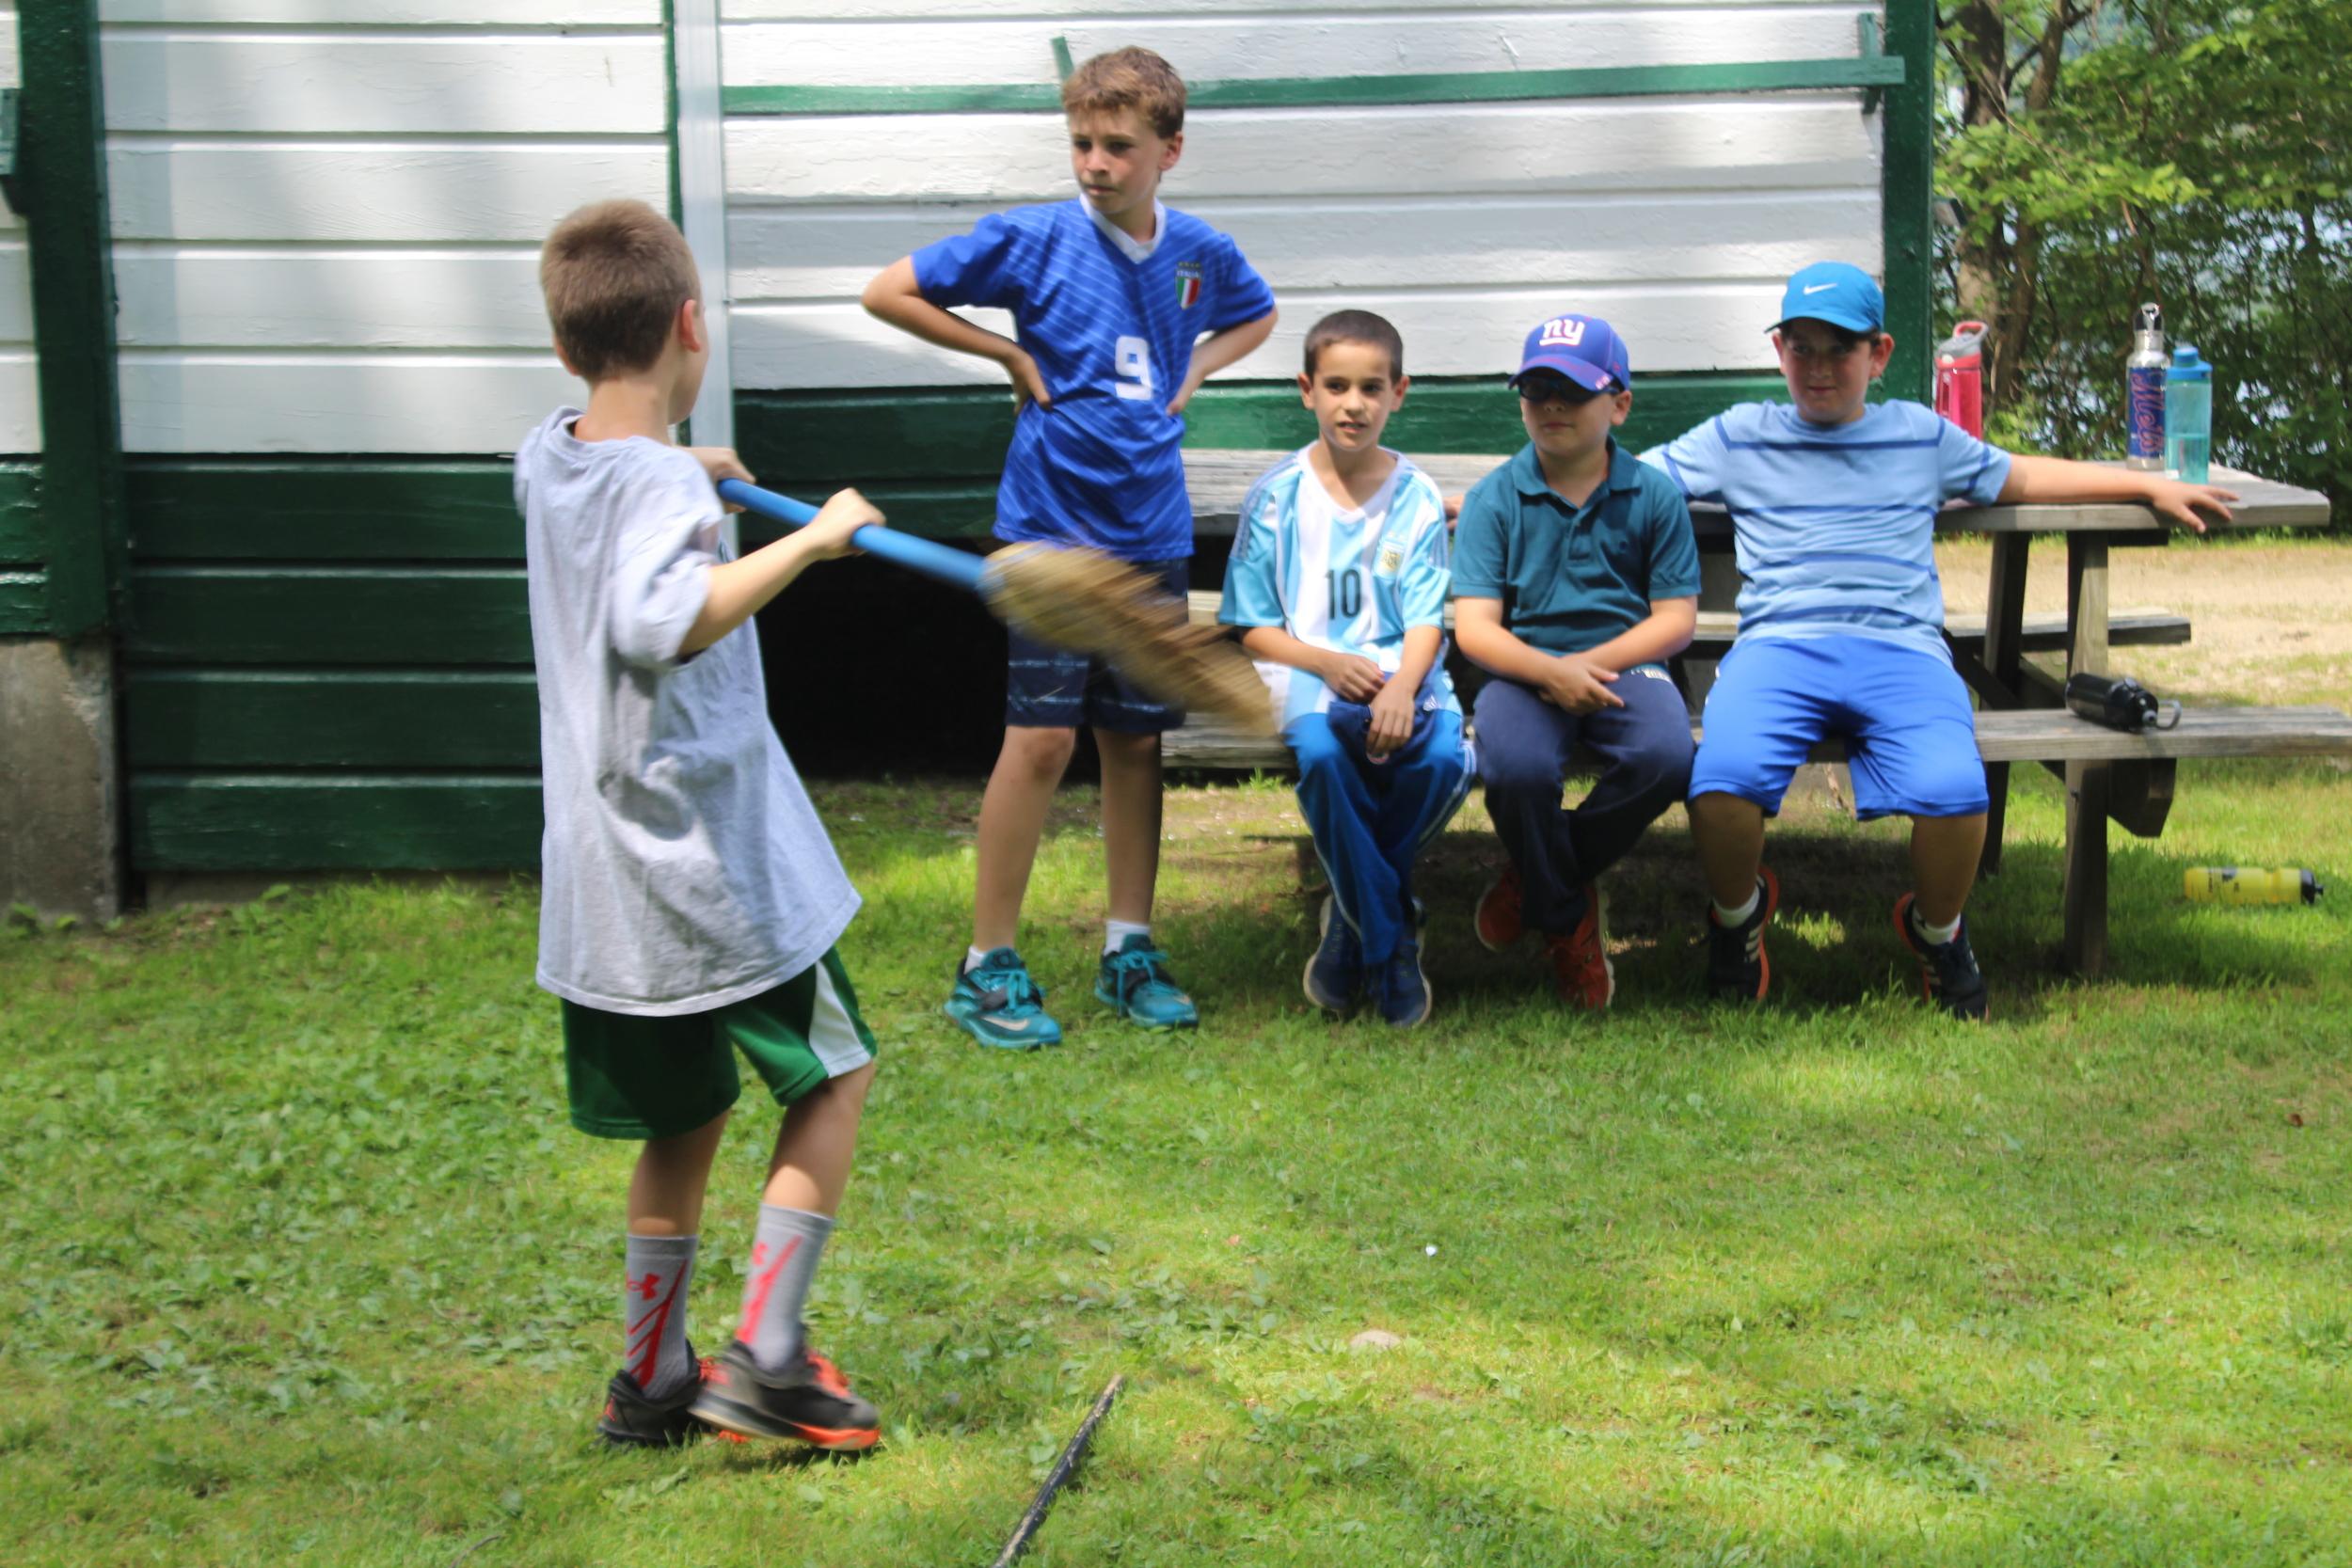 Soph boys observe the broom toss in All Stars.